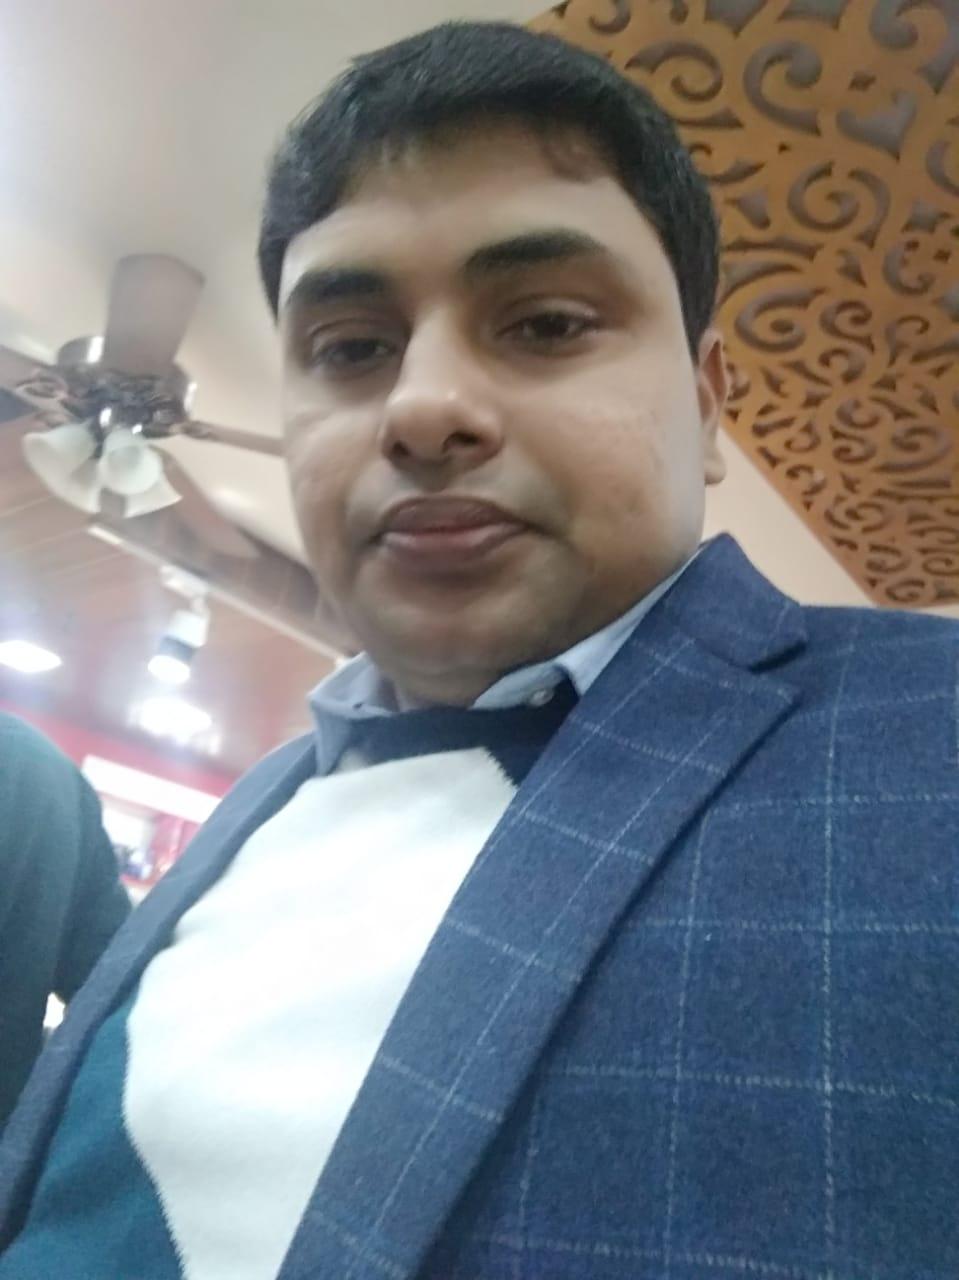 WhatsApp Image 2019-01-22 at 5.52.28 PM